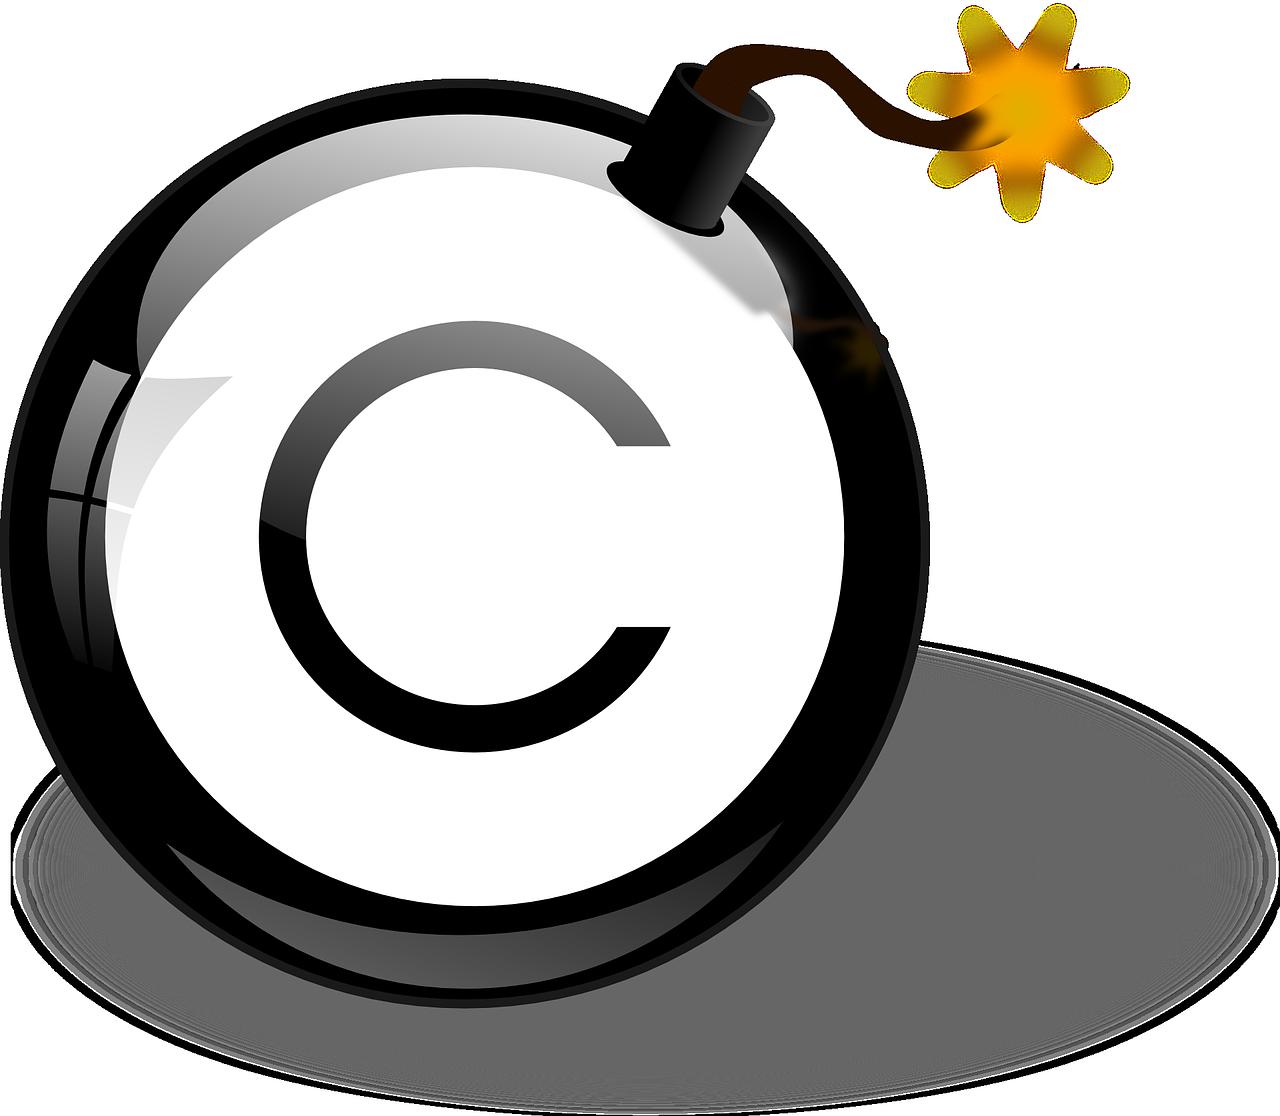 https://pixabay.com/en/bomb-copyright-explosive-danger-156107/